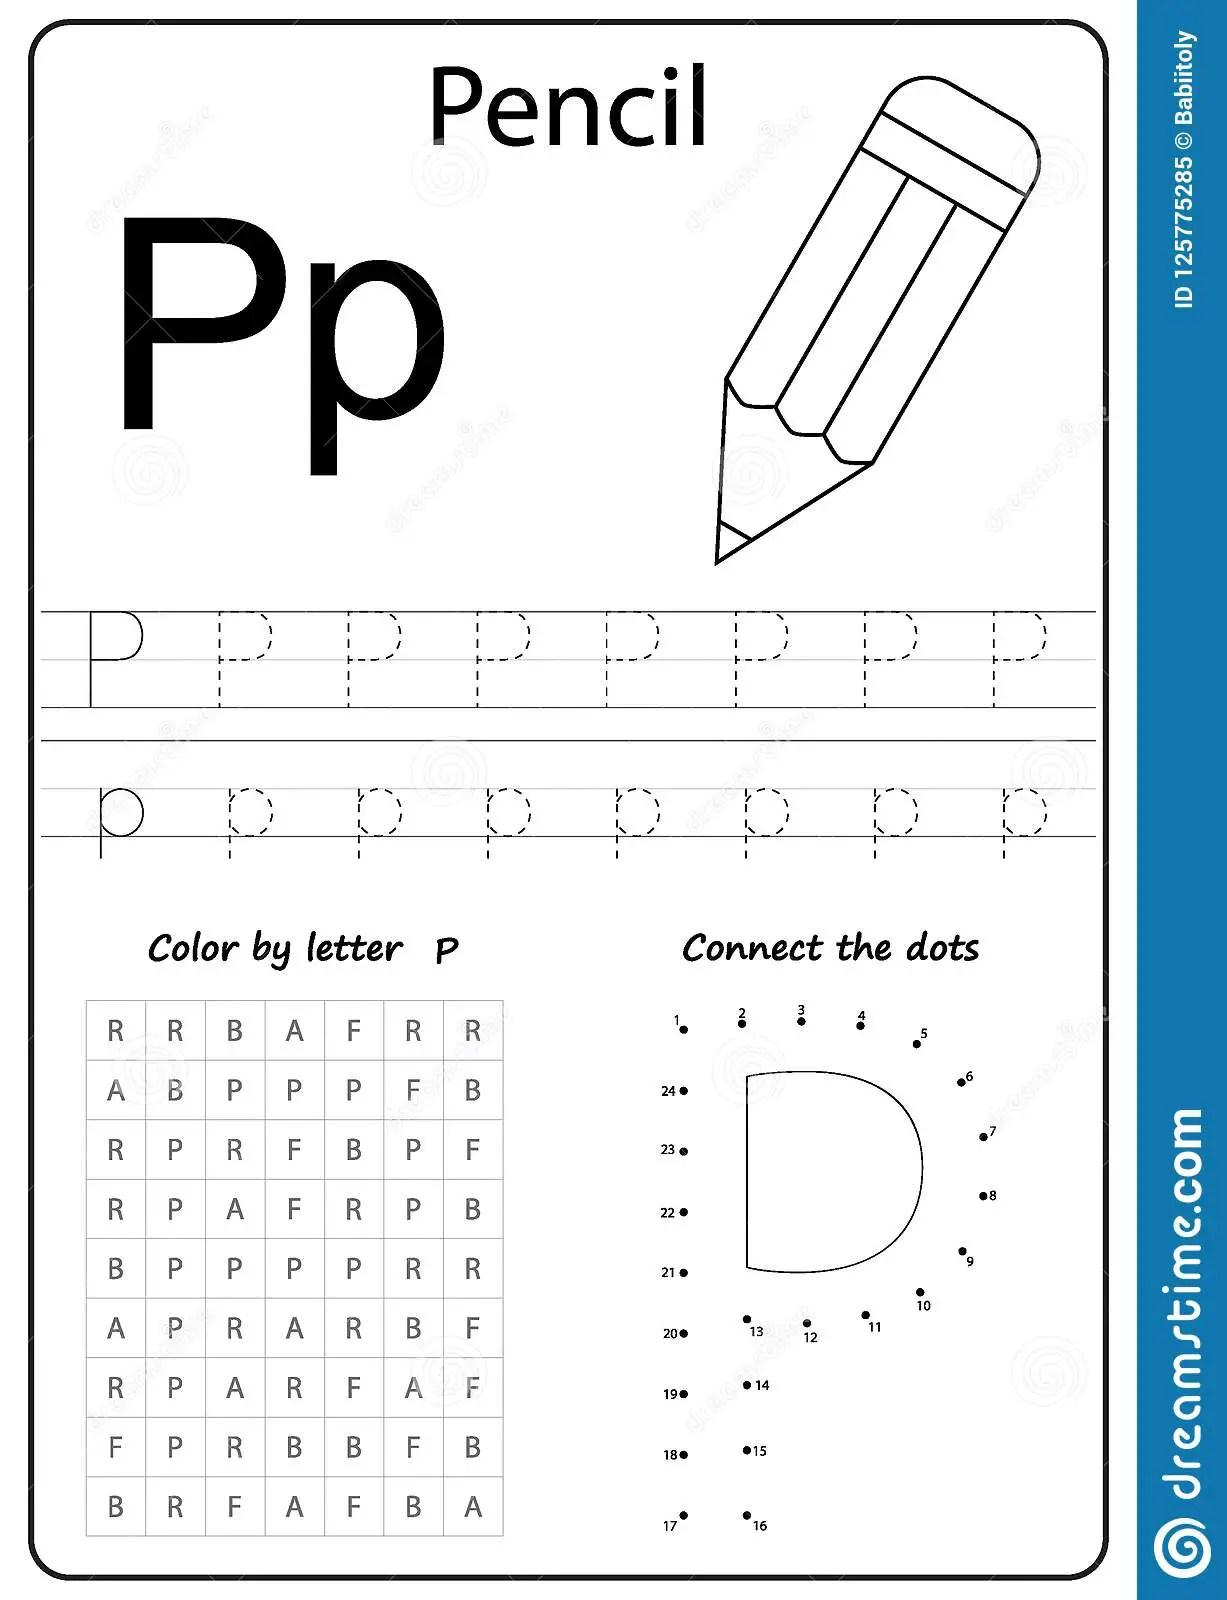 14 Constructive Letter P Worksheets